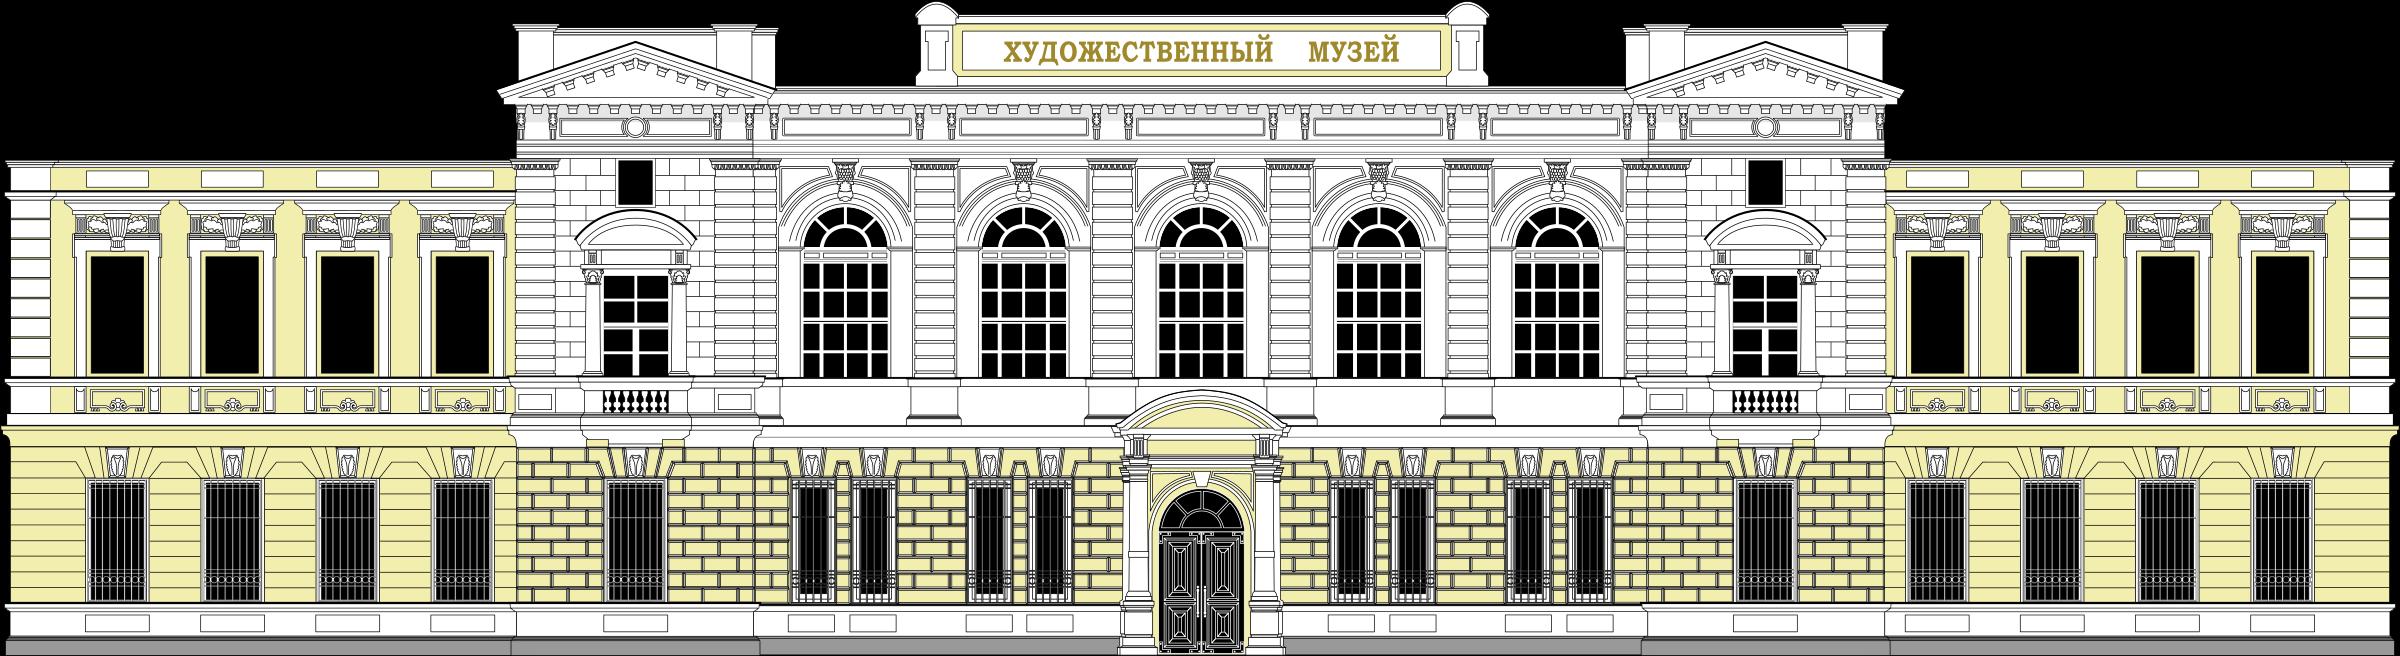 Free Irkutsk Museum of Fine Arts Clip Art.